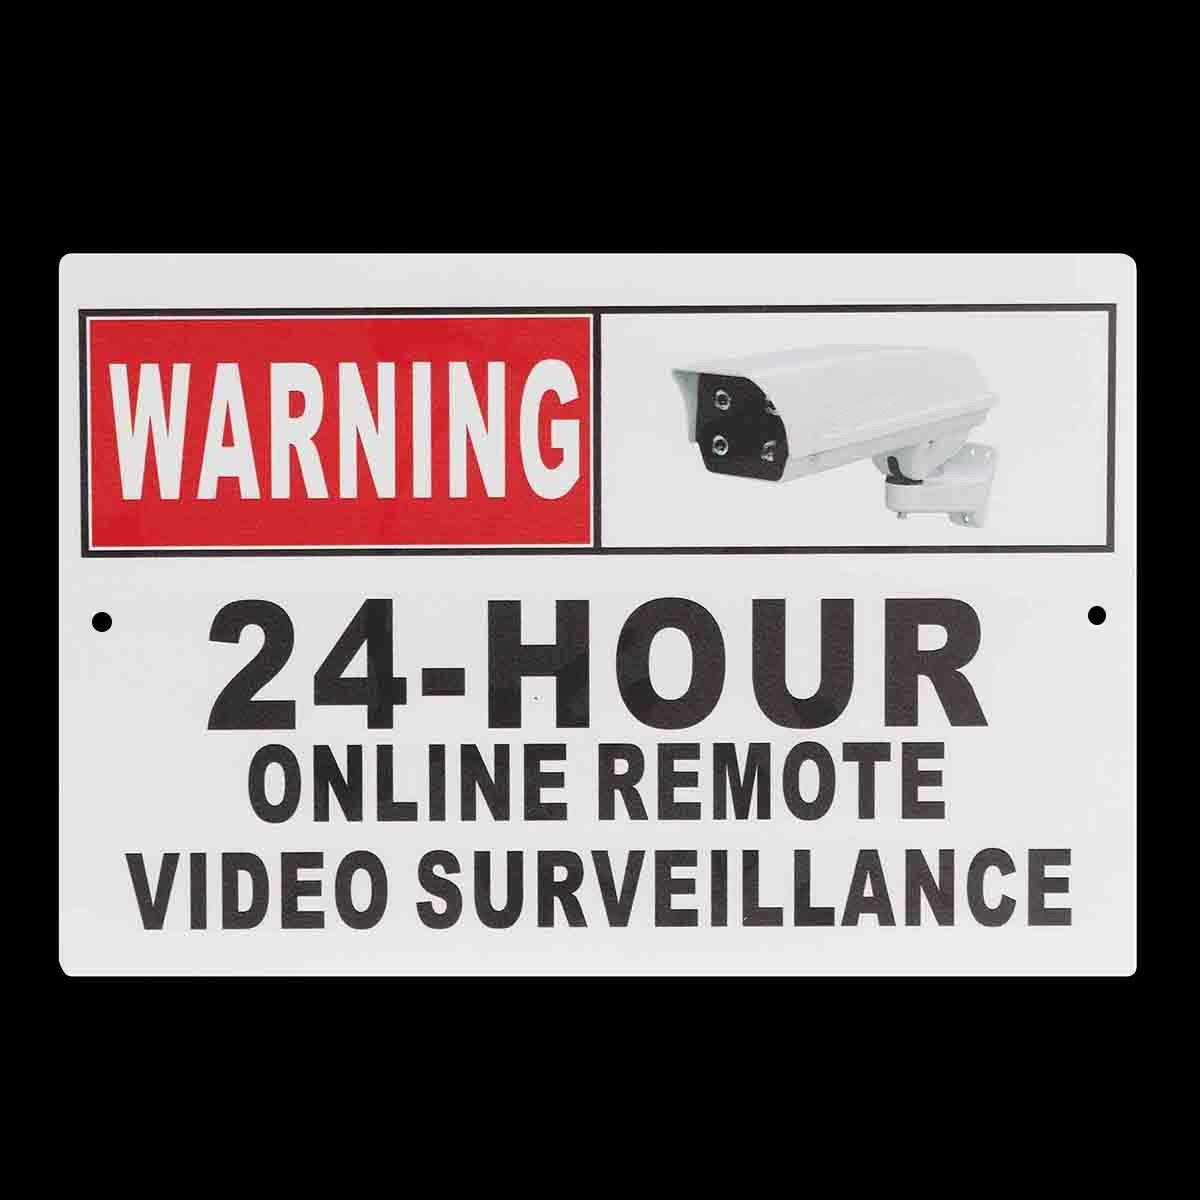 QOJA 30 x 20cm (12'' x 8'') 24 hour online remote video surveillance